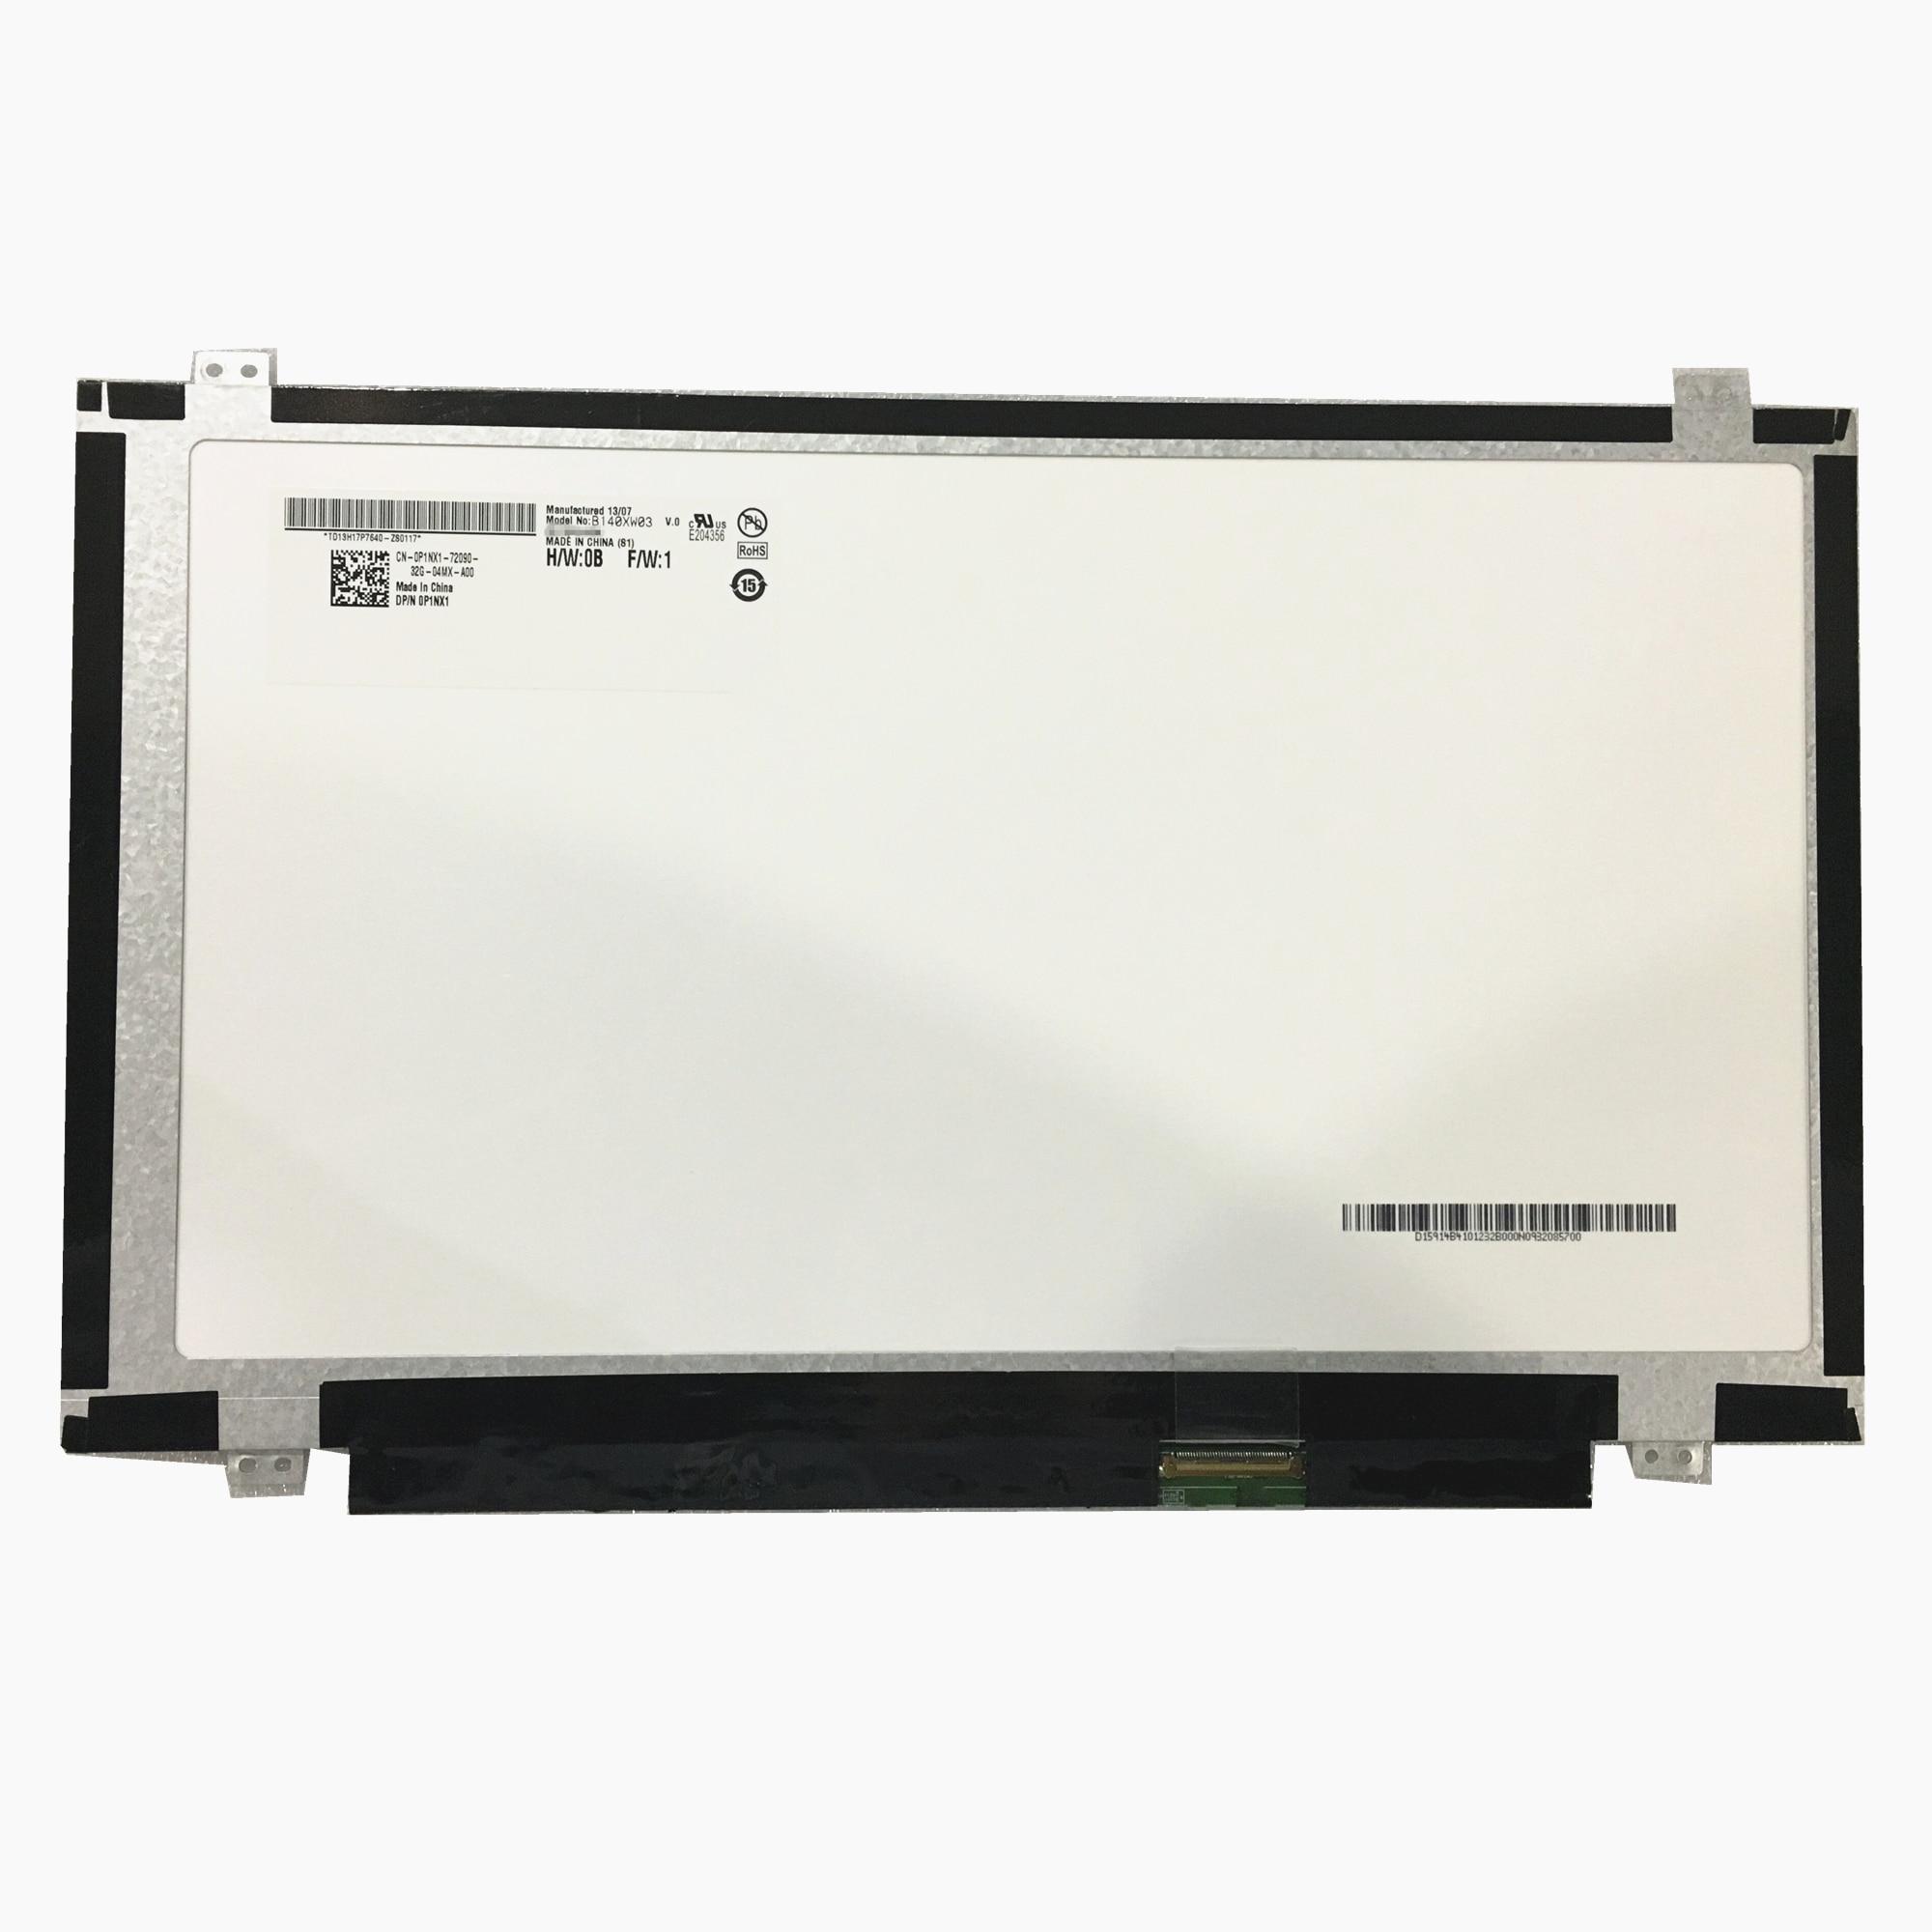 Free shipping B140XW03 V.0 V.1 V.2 B140XW02 V.2 BT140GW03 N140BGE L31 L41  LTN140AT20 LTN140AT26 Lcd Screen 40 Pins|laptop screen|b140xw03 v.0notebook  screen - AliExpress